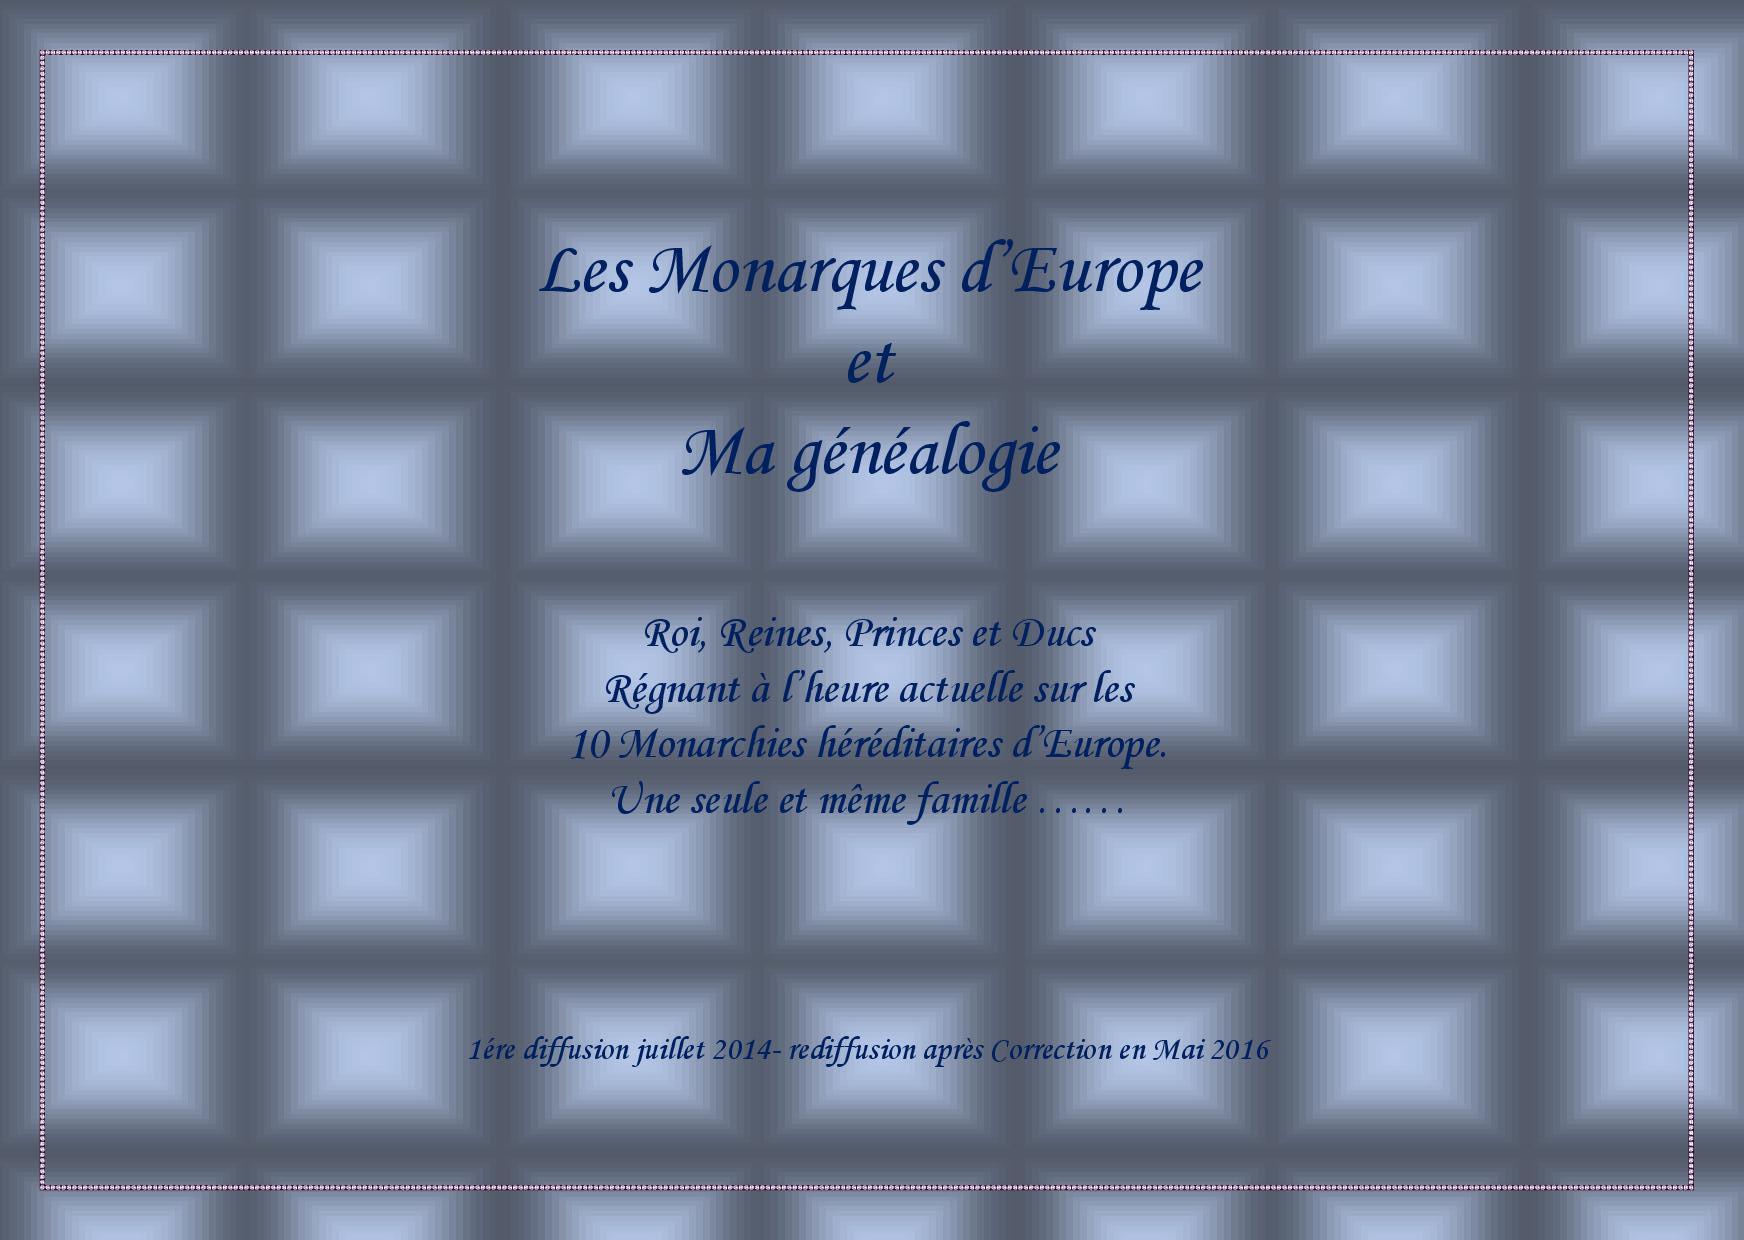 les_Monarques_heriditaires_d_Europe_et_ma_genealogie_30_05_2016.jpg